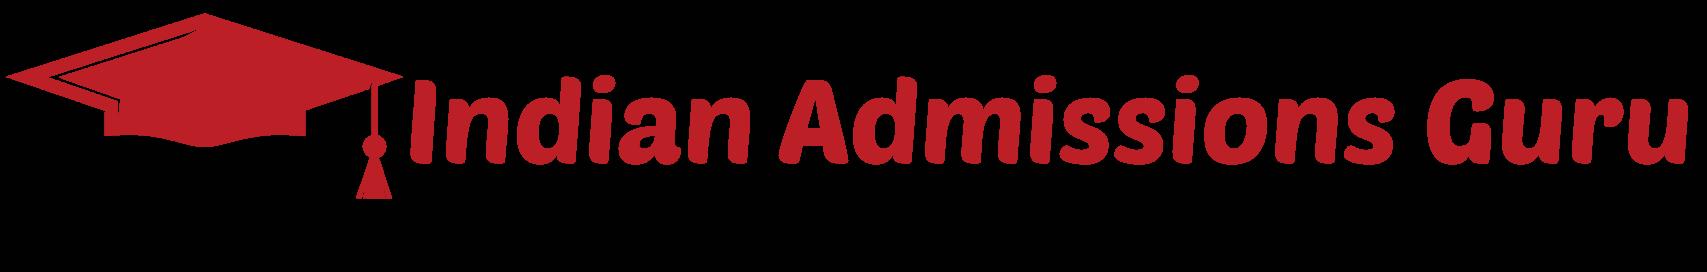 Indian Admissions Guru